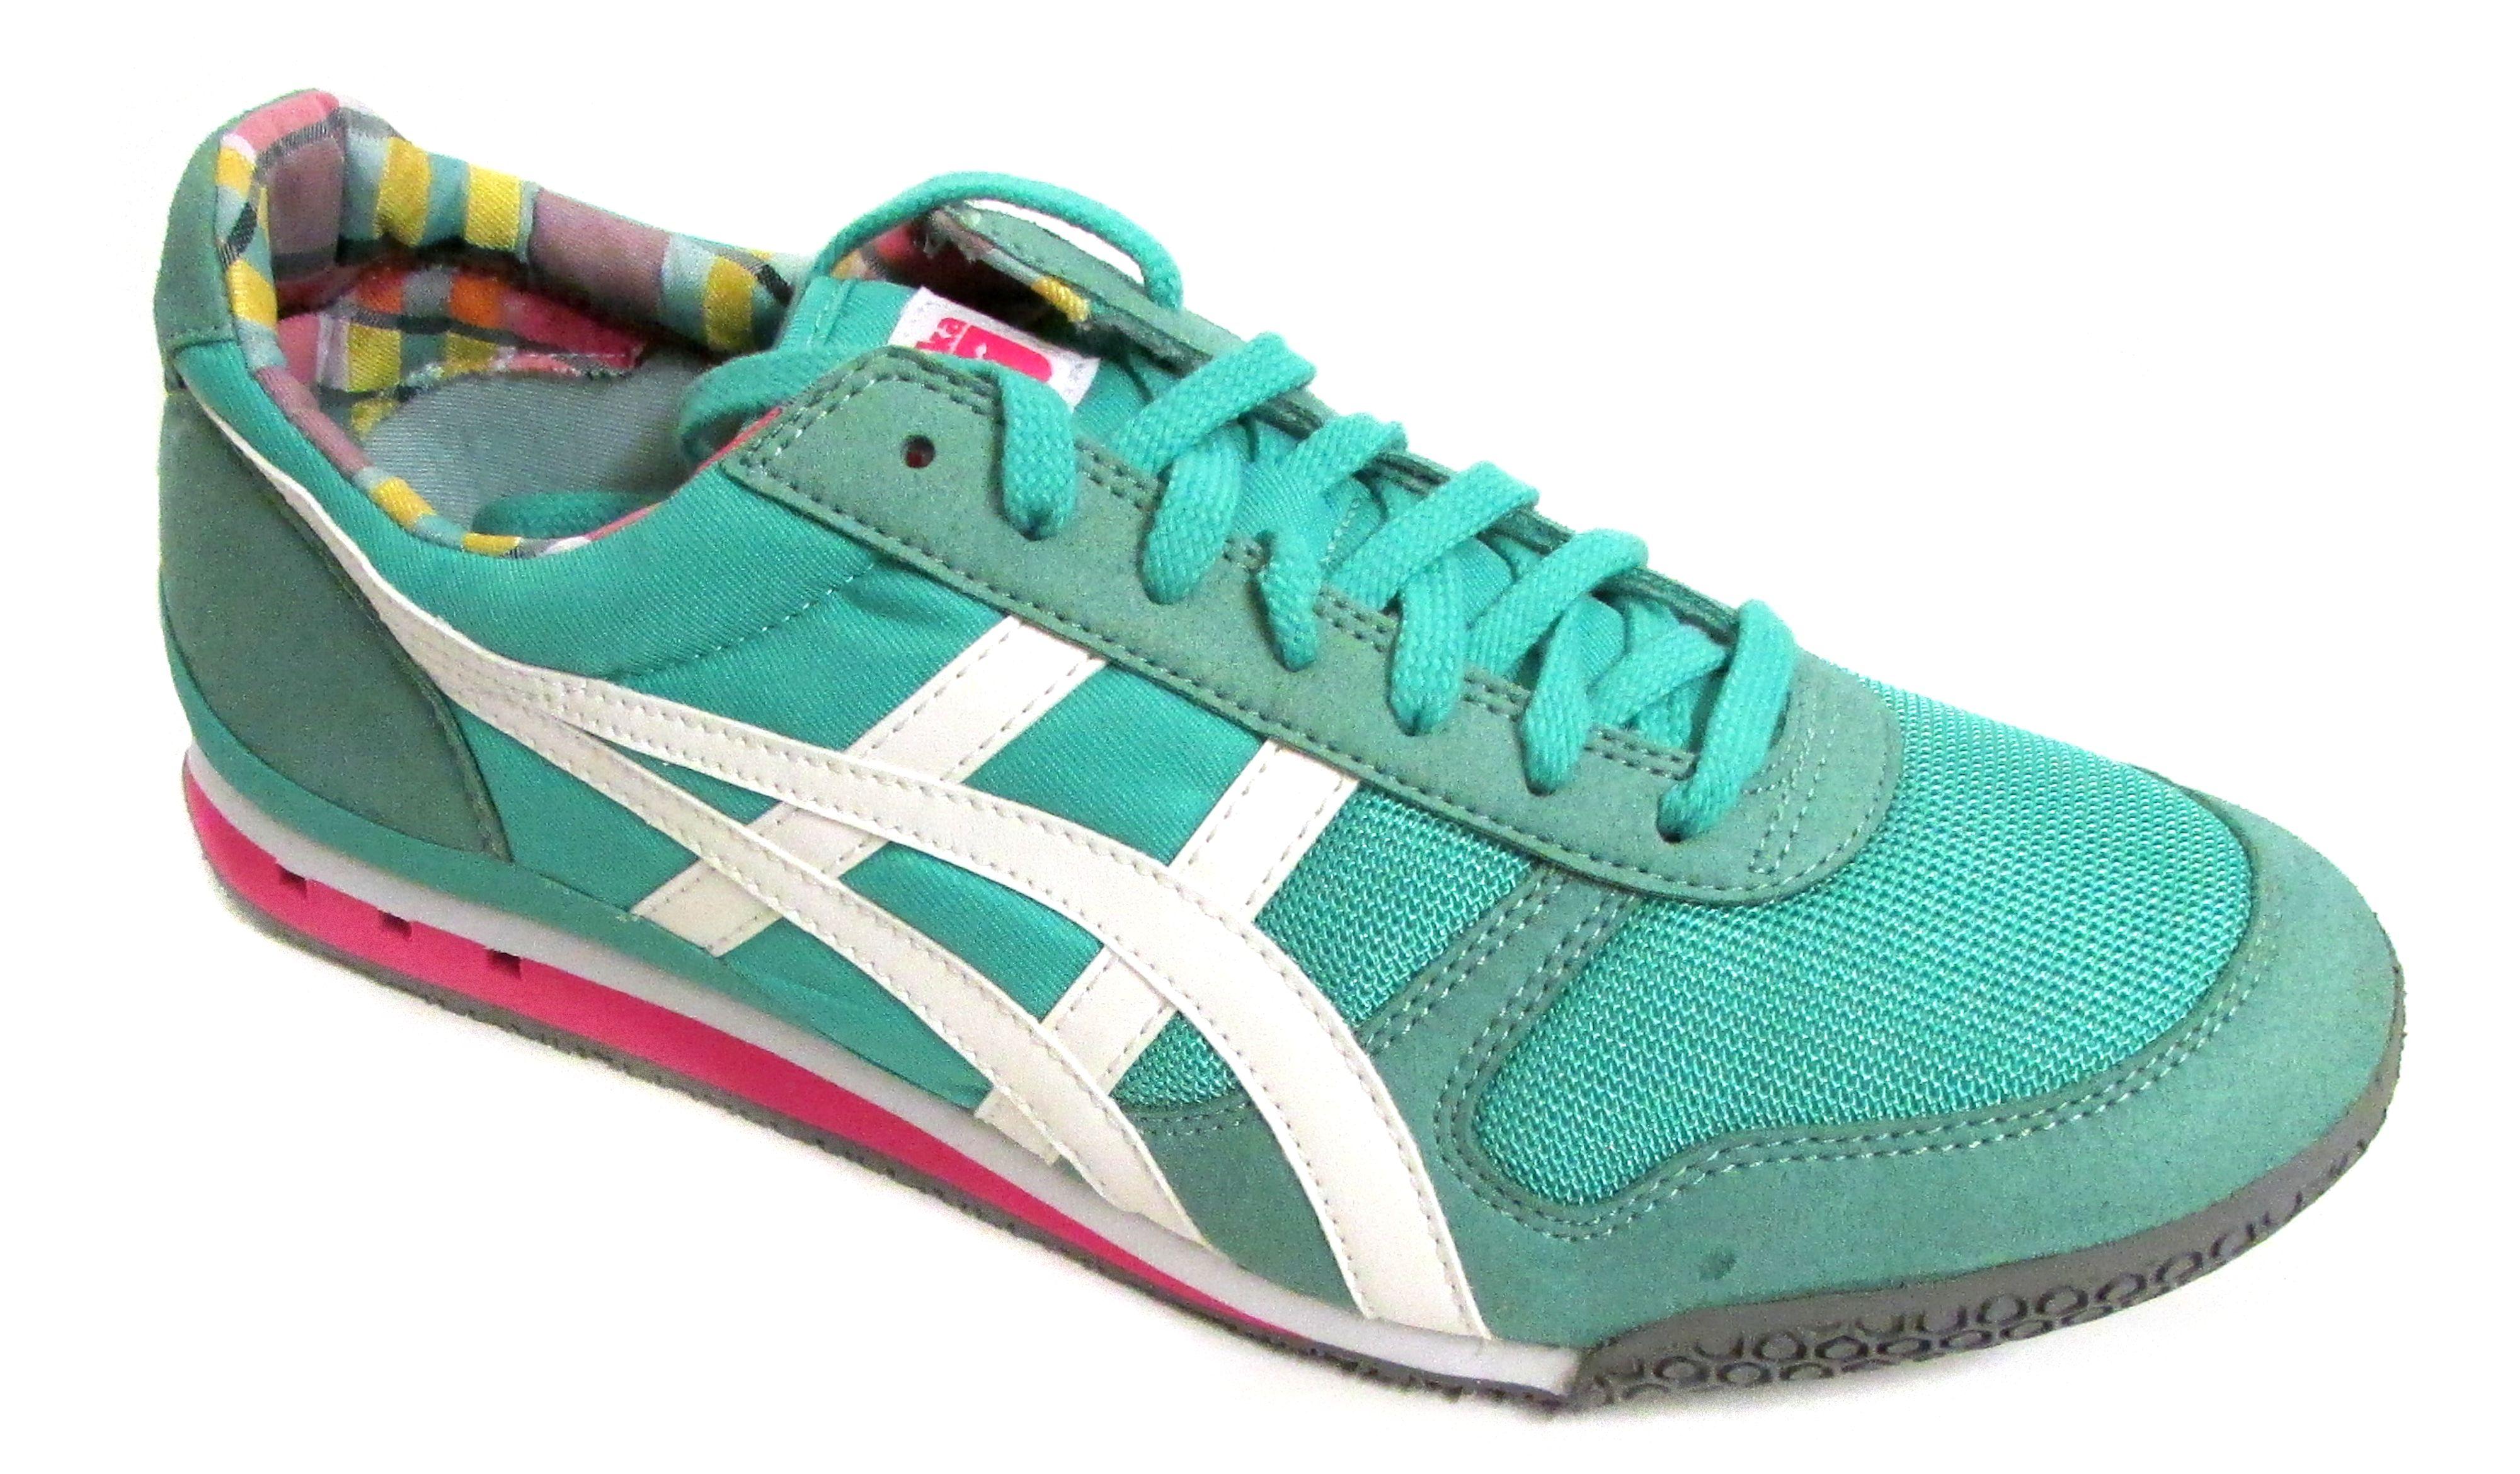 onitsuka tiger serrano classic running shoe